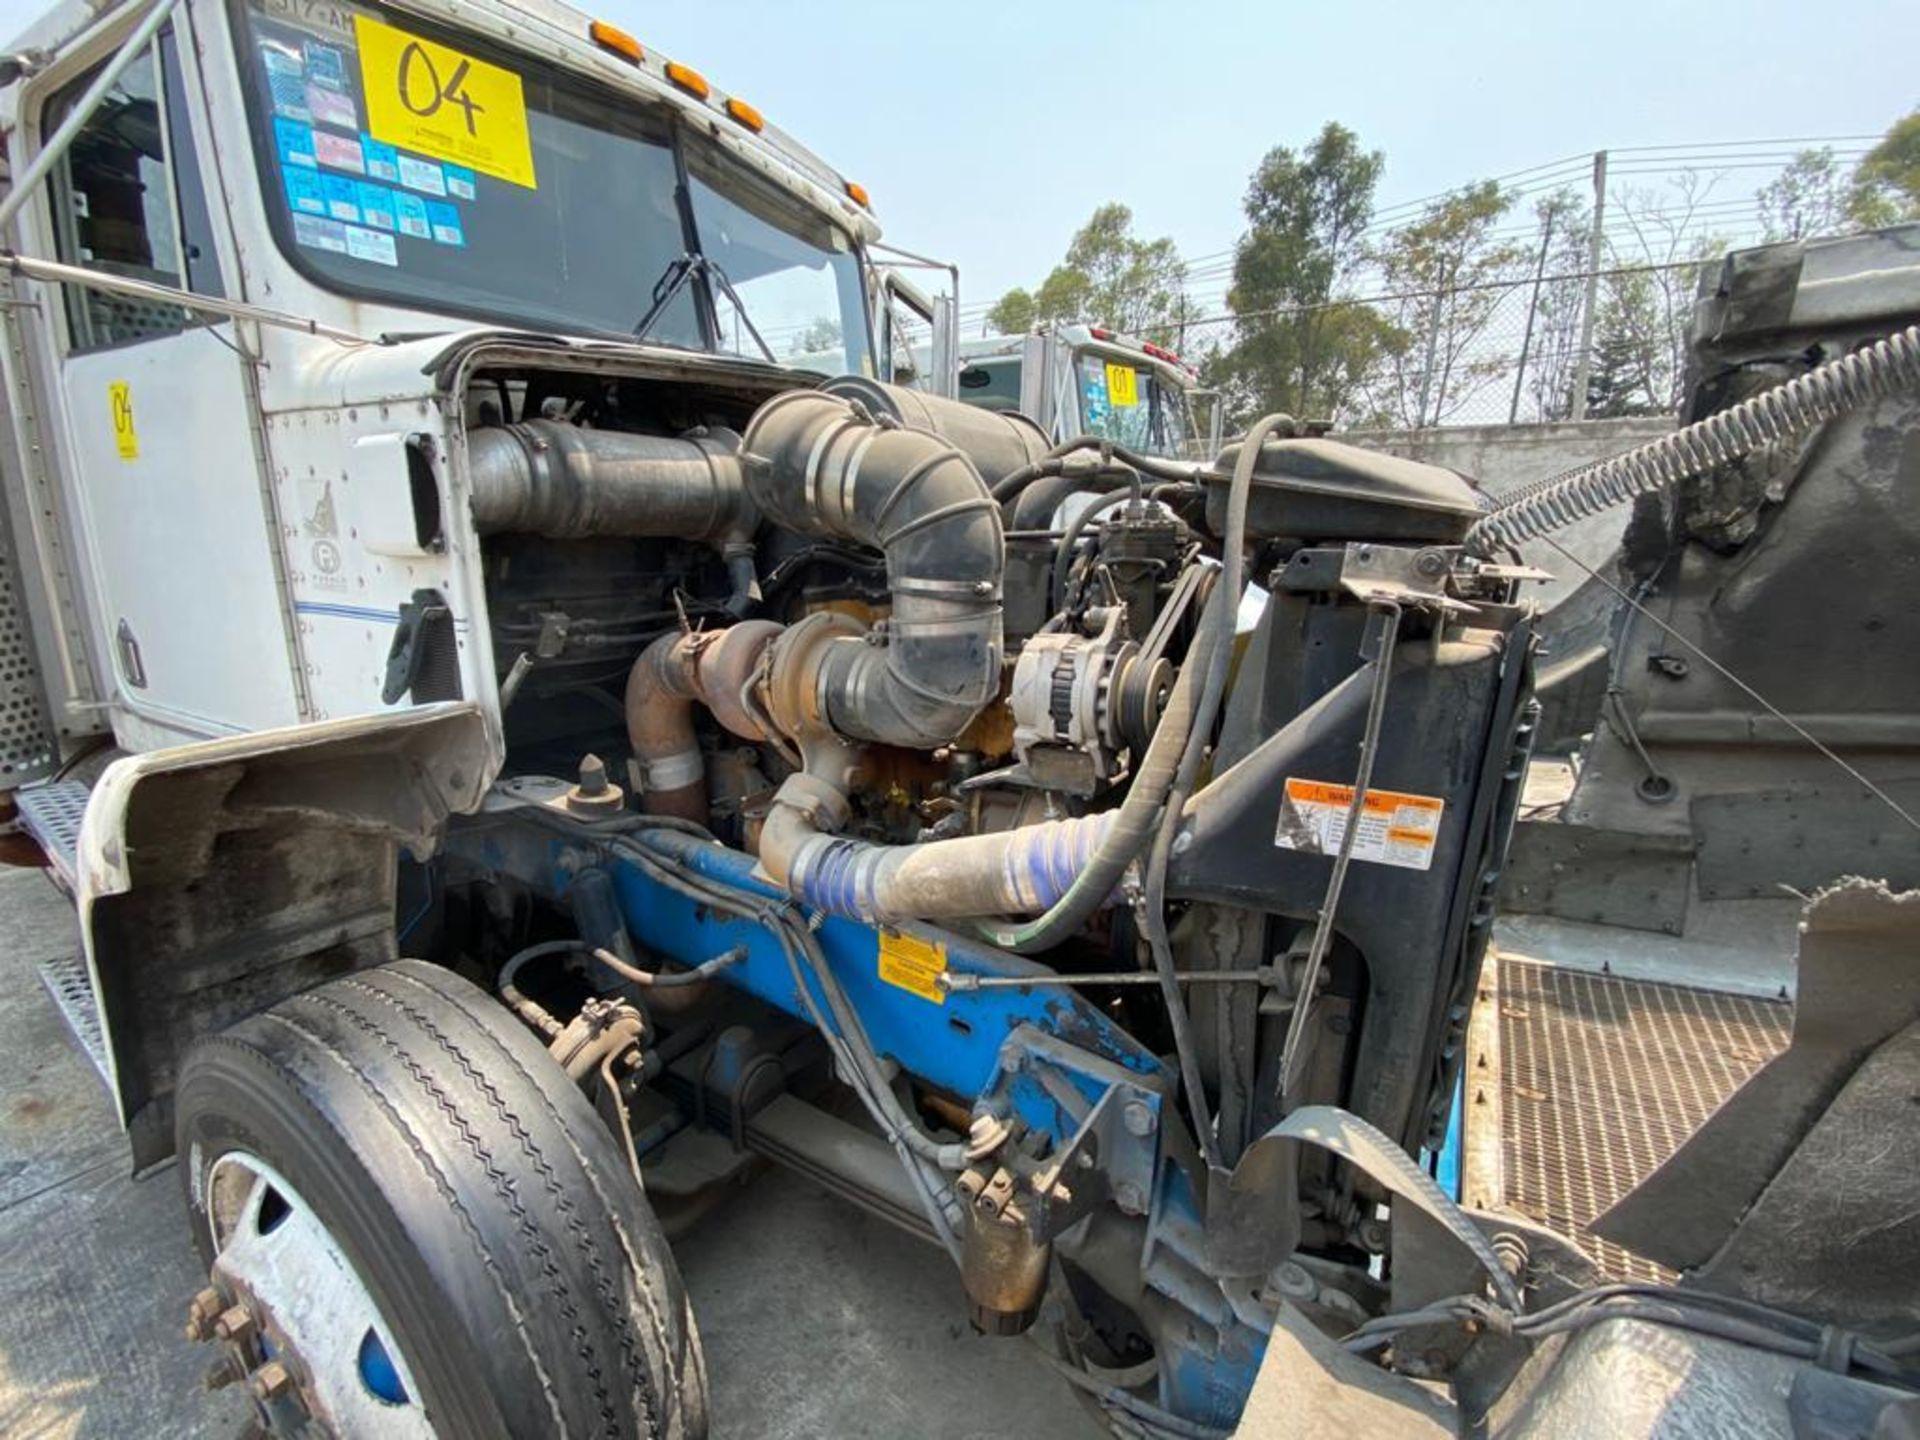 1999 Kenworth Sleeper truck tractor, standard transmission of 18 speeds - Image 67 of 70